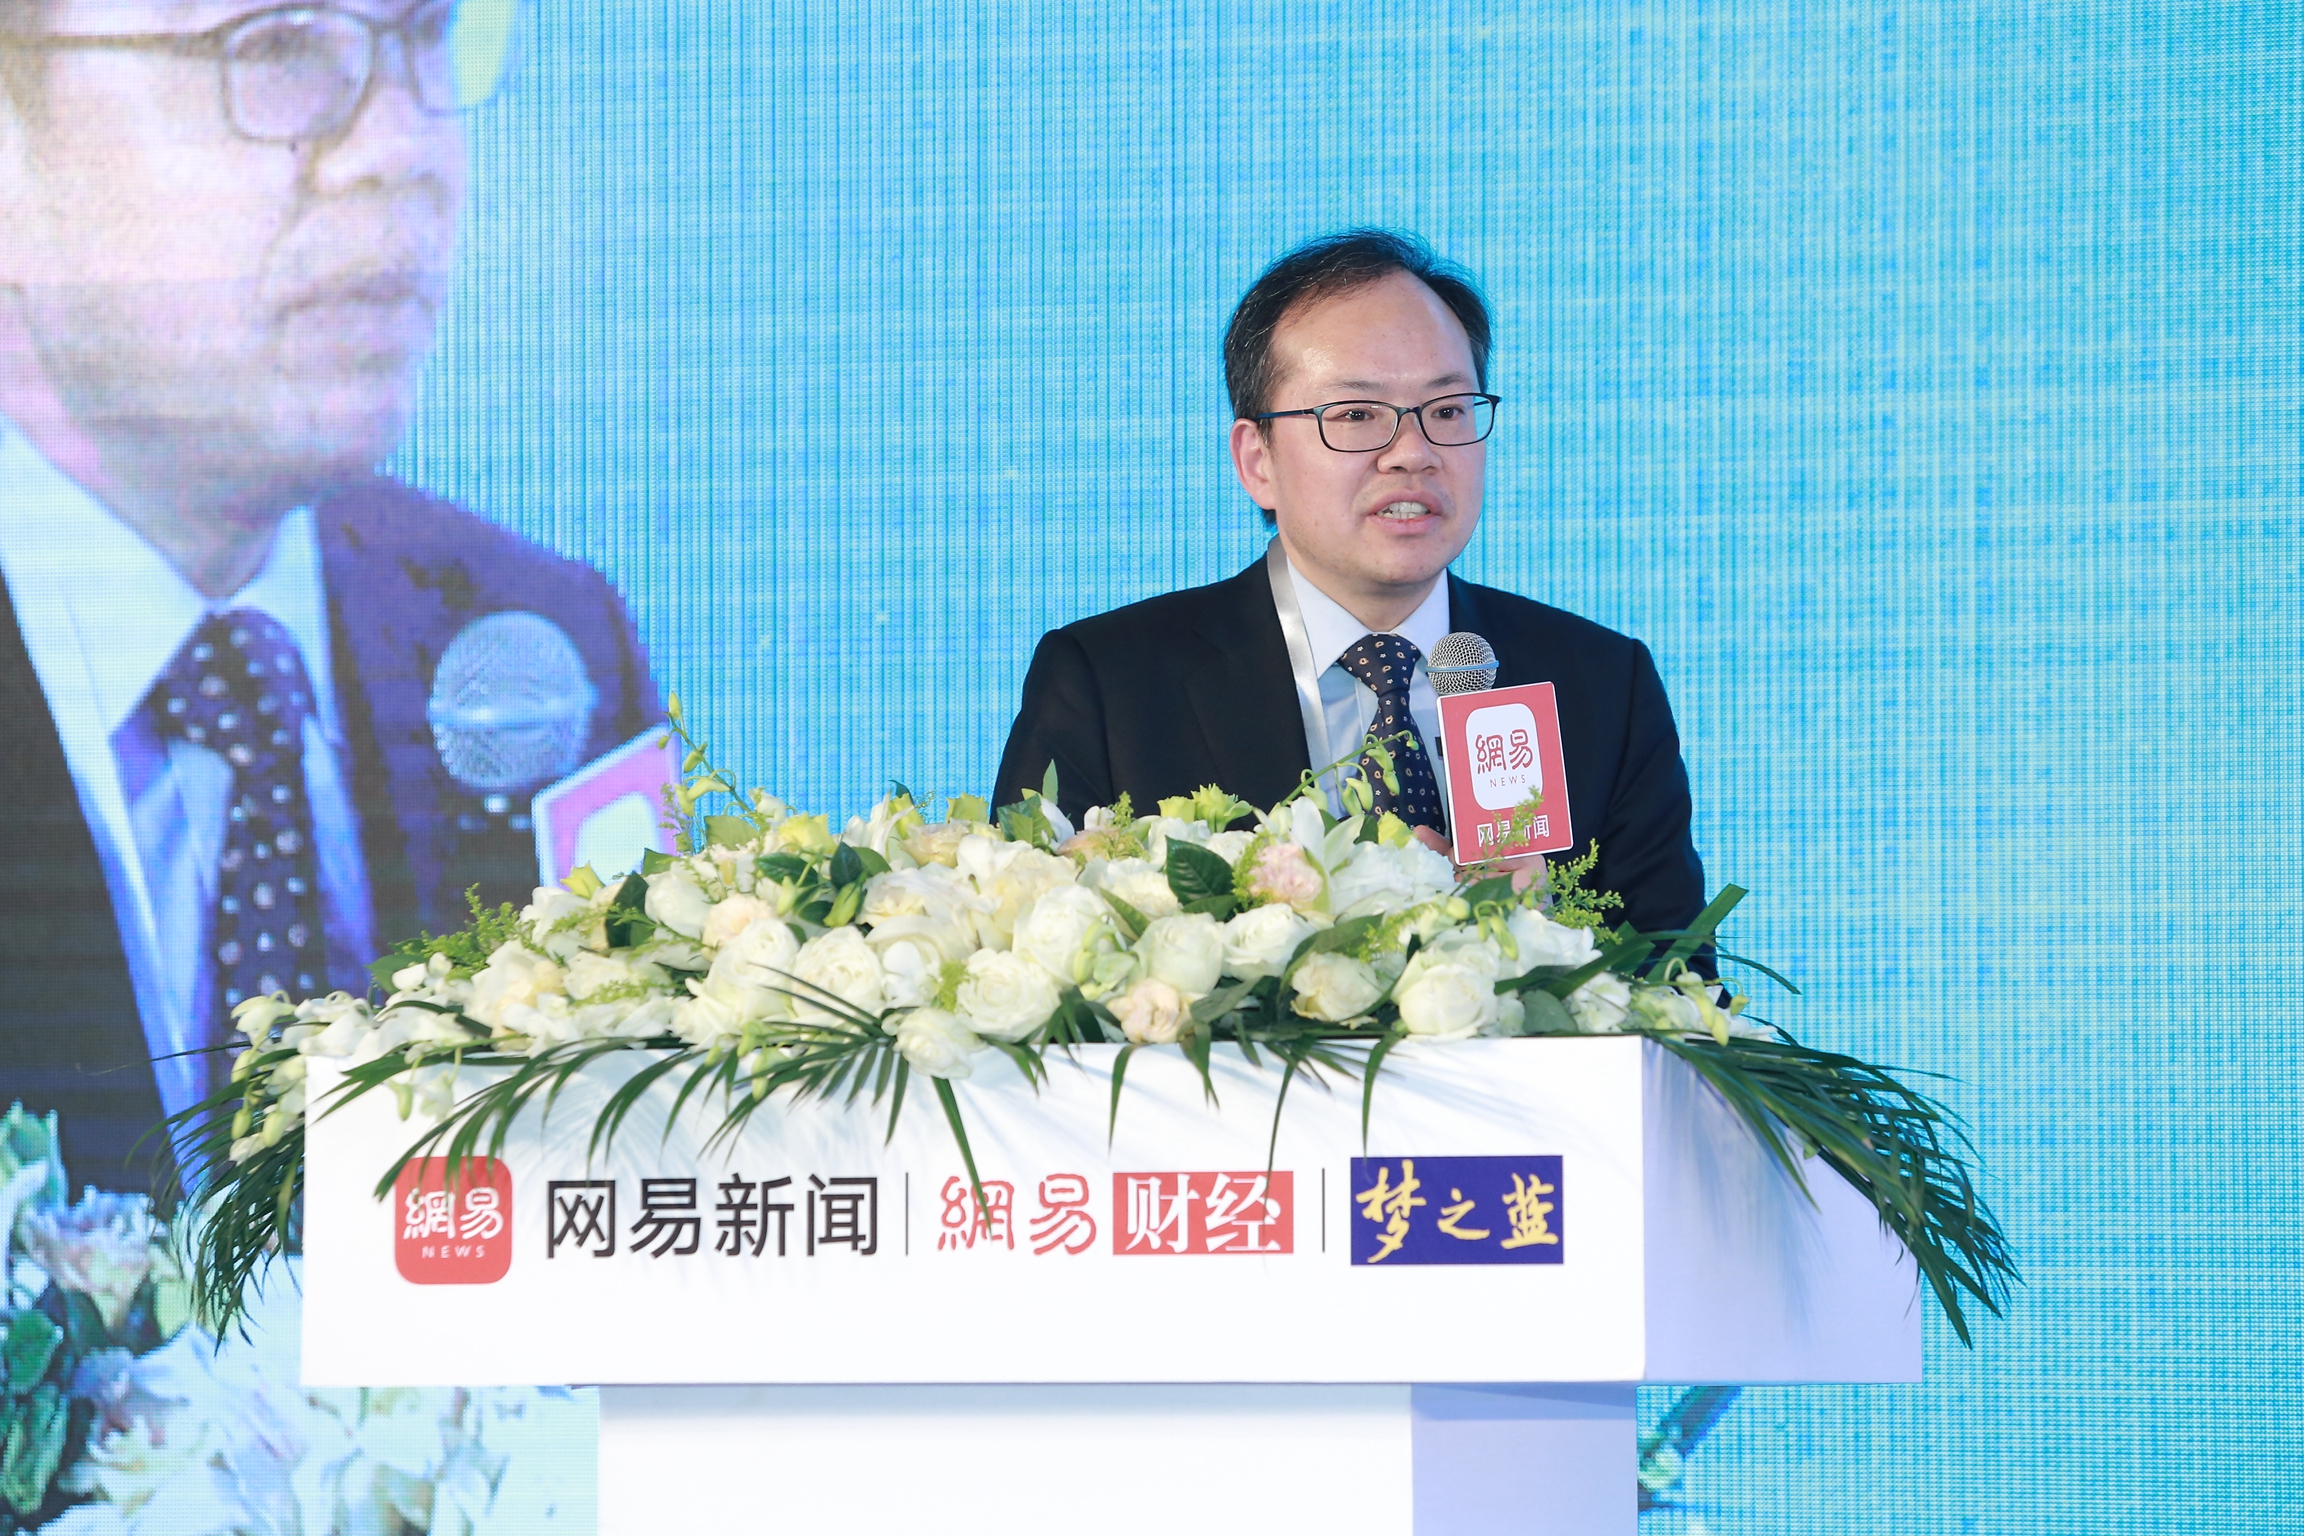 2008gdp增速_祝宝良:预计中国今年GDP增速约6.5%建议人民币适当贬值